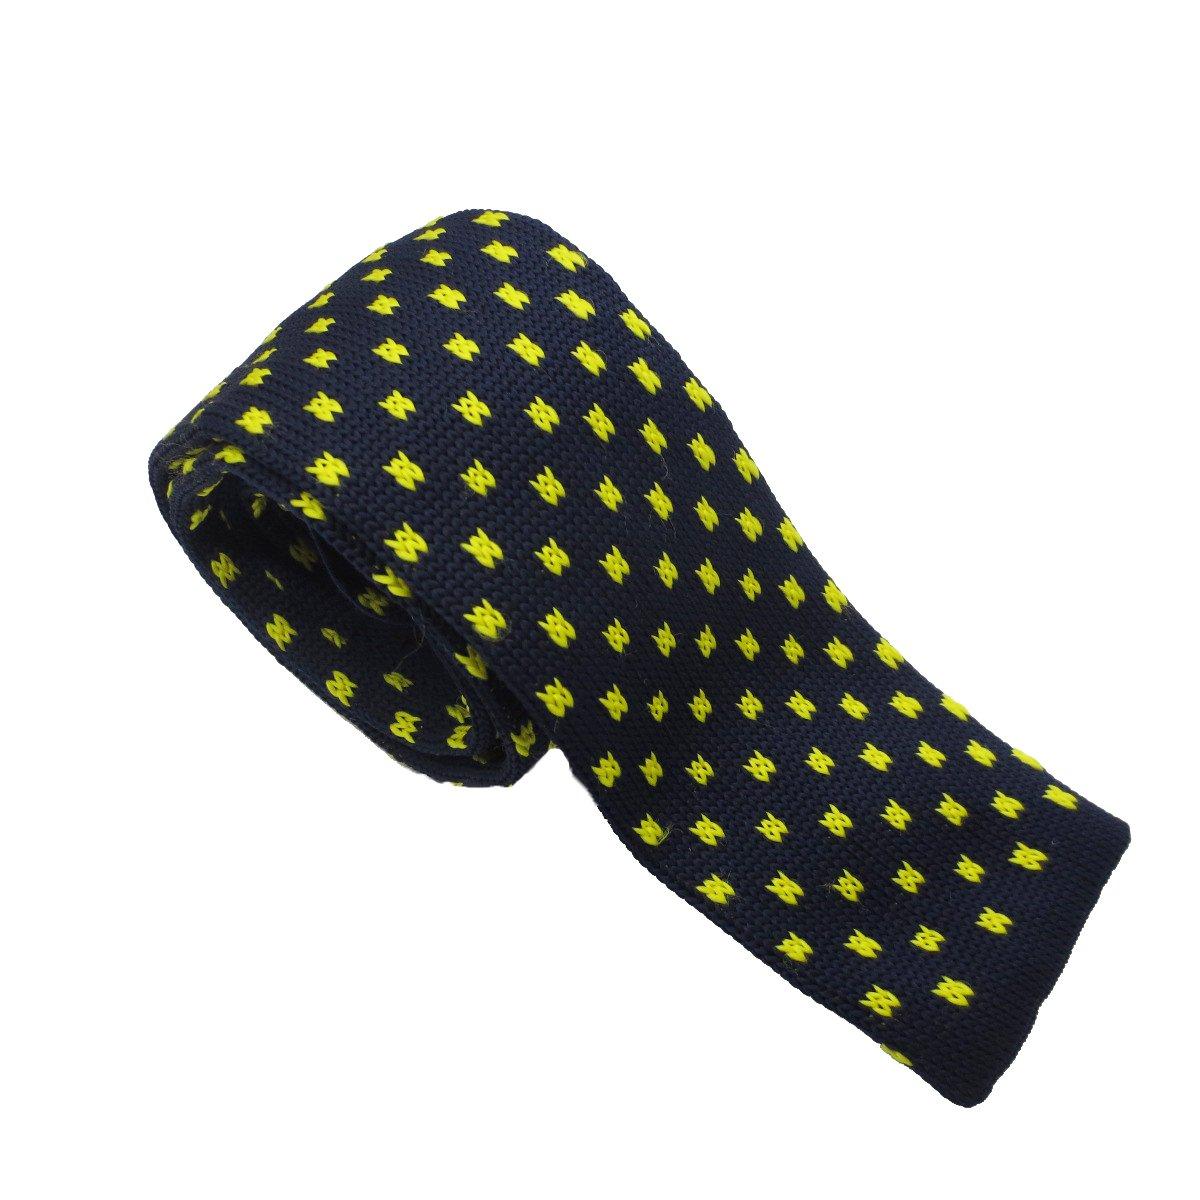 Szeagle Corbata de hombre de poliéster con diseño de puntos ...